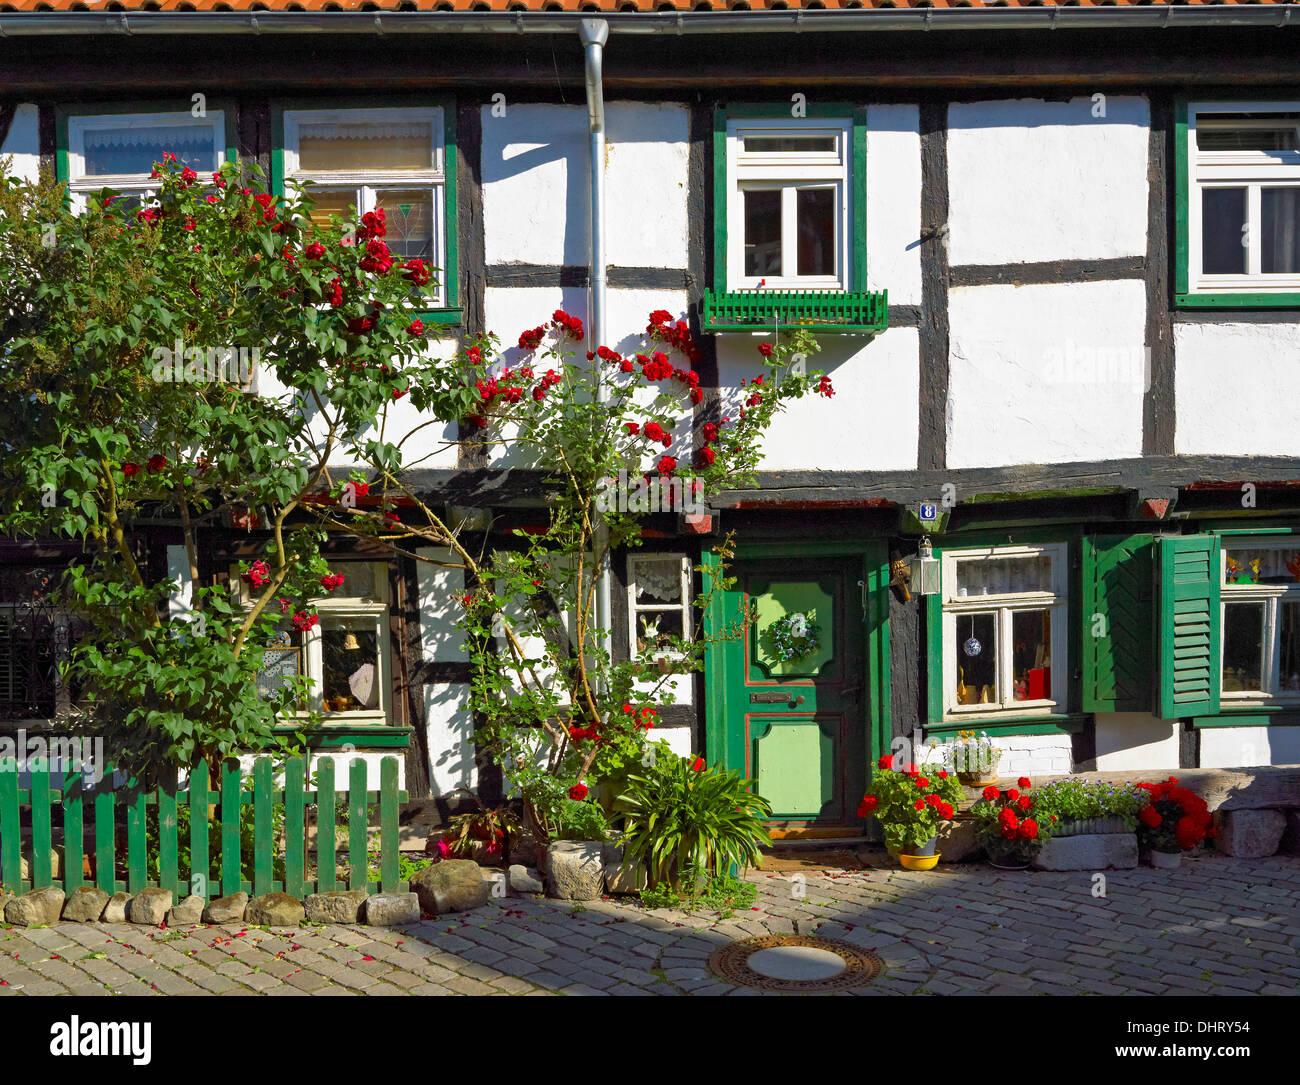 Artisan cottage, Grauer Hof, Halberstadt, Saxony-Anhalt, Germany - Stock Image